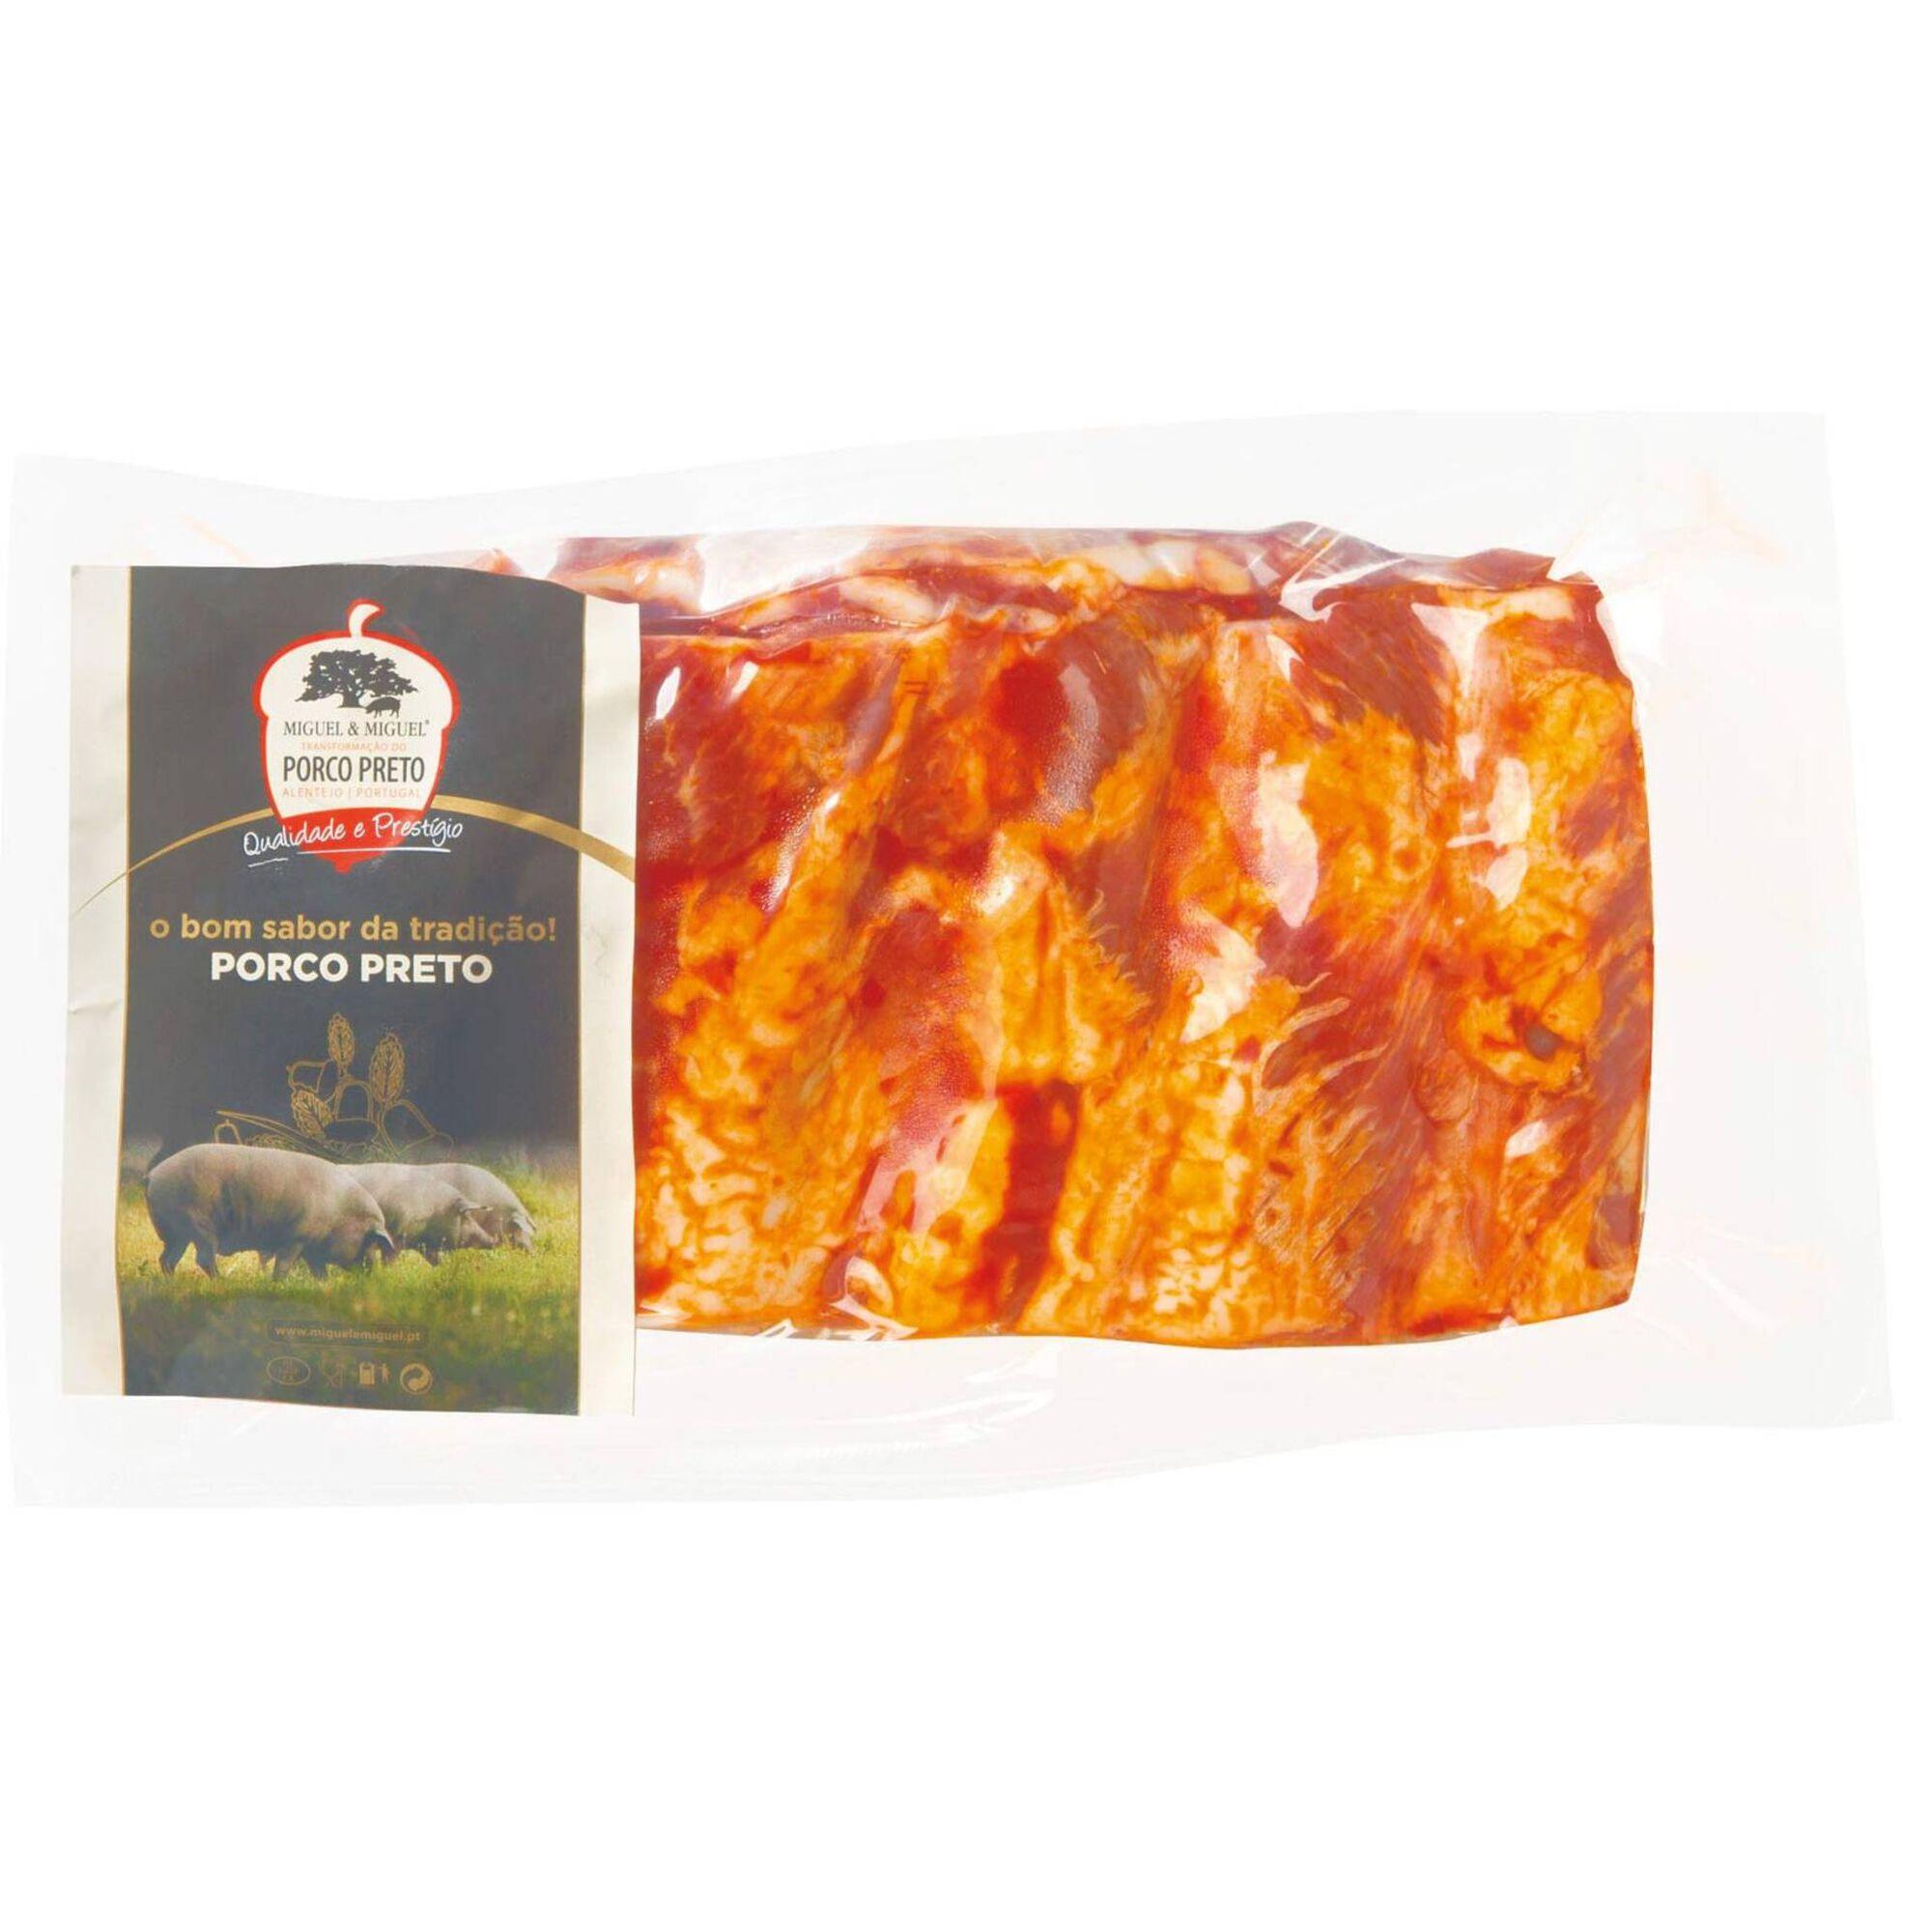 Tiras de Entrecosto Porco Preto Temperado com Pimenta